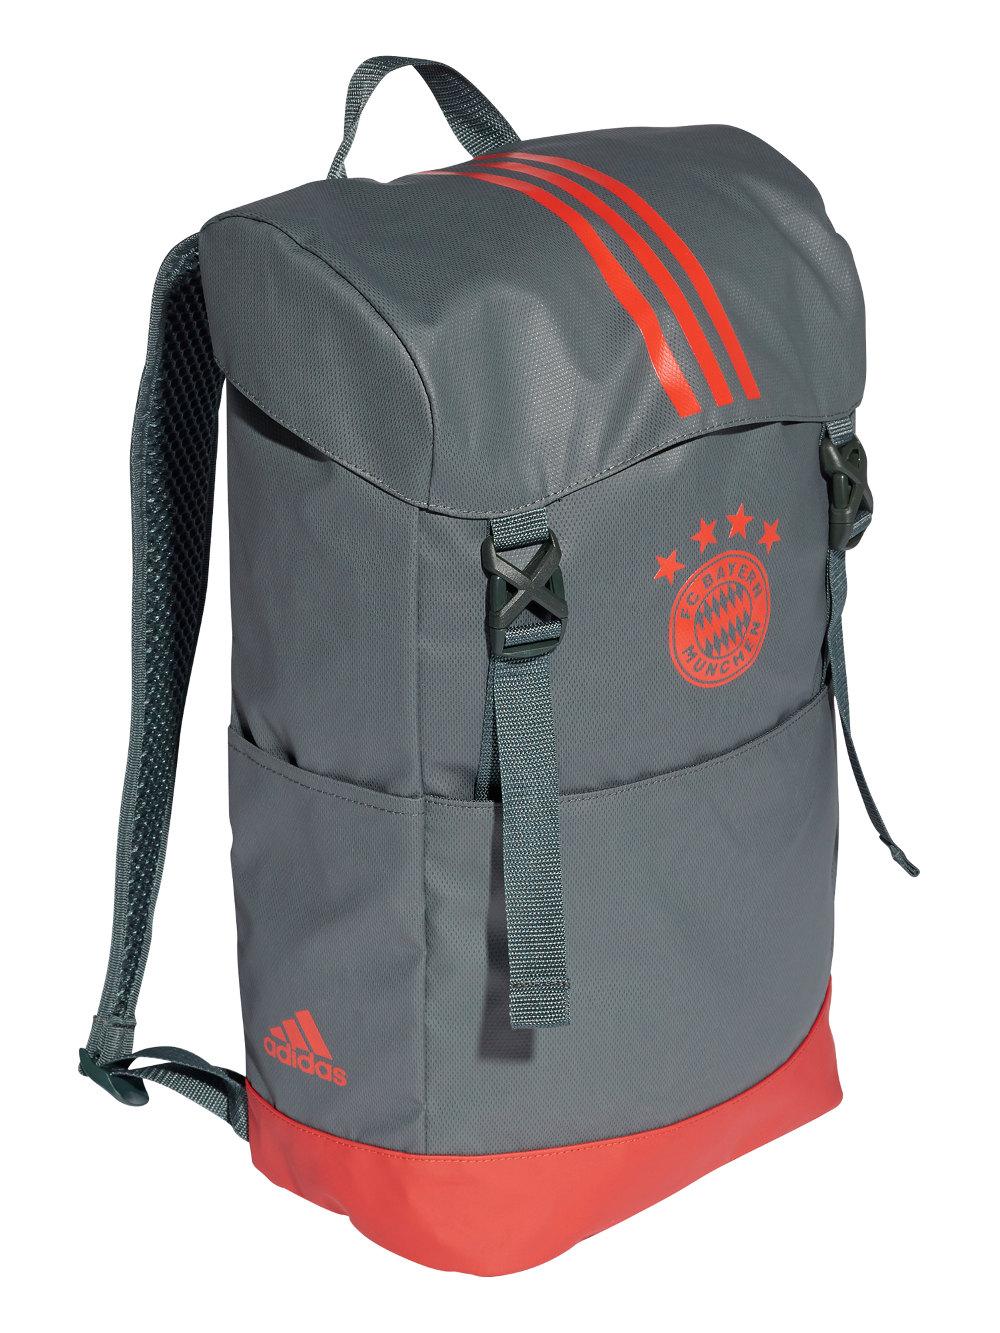 Espressive Bayern Monaco Adidas Zaino Backpack Rucksack Tg Unisex Grigio 2019